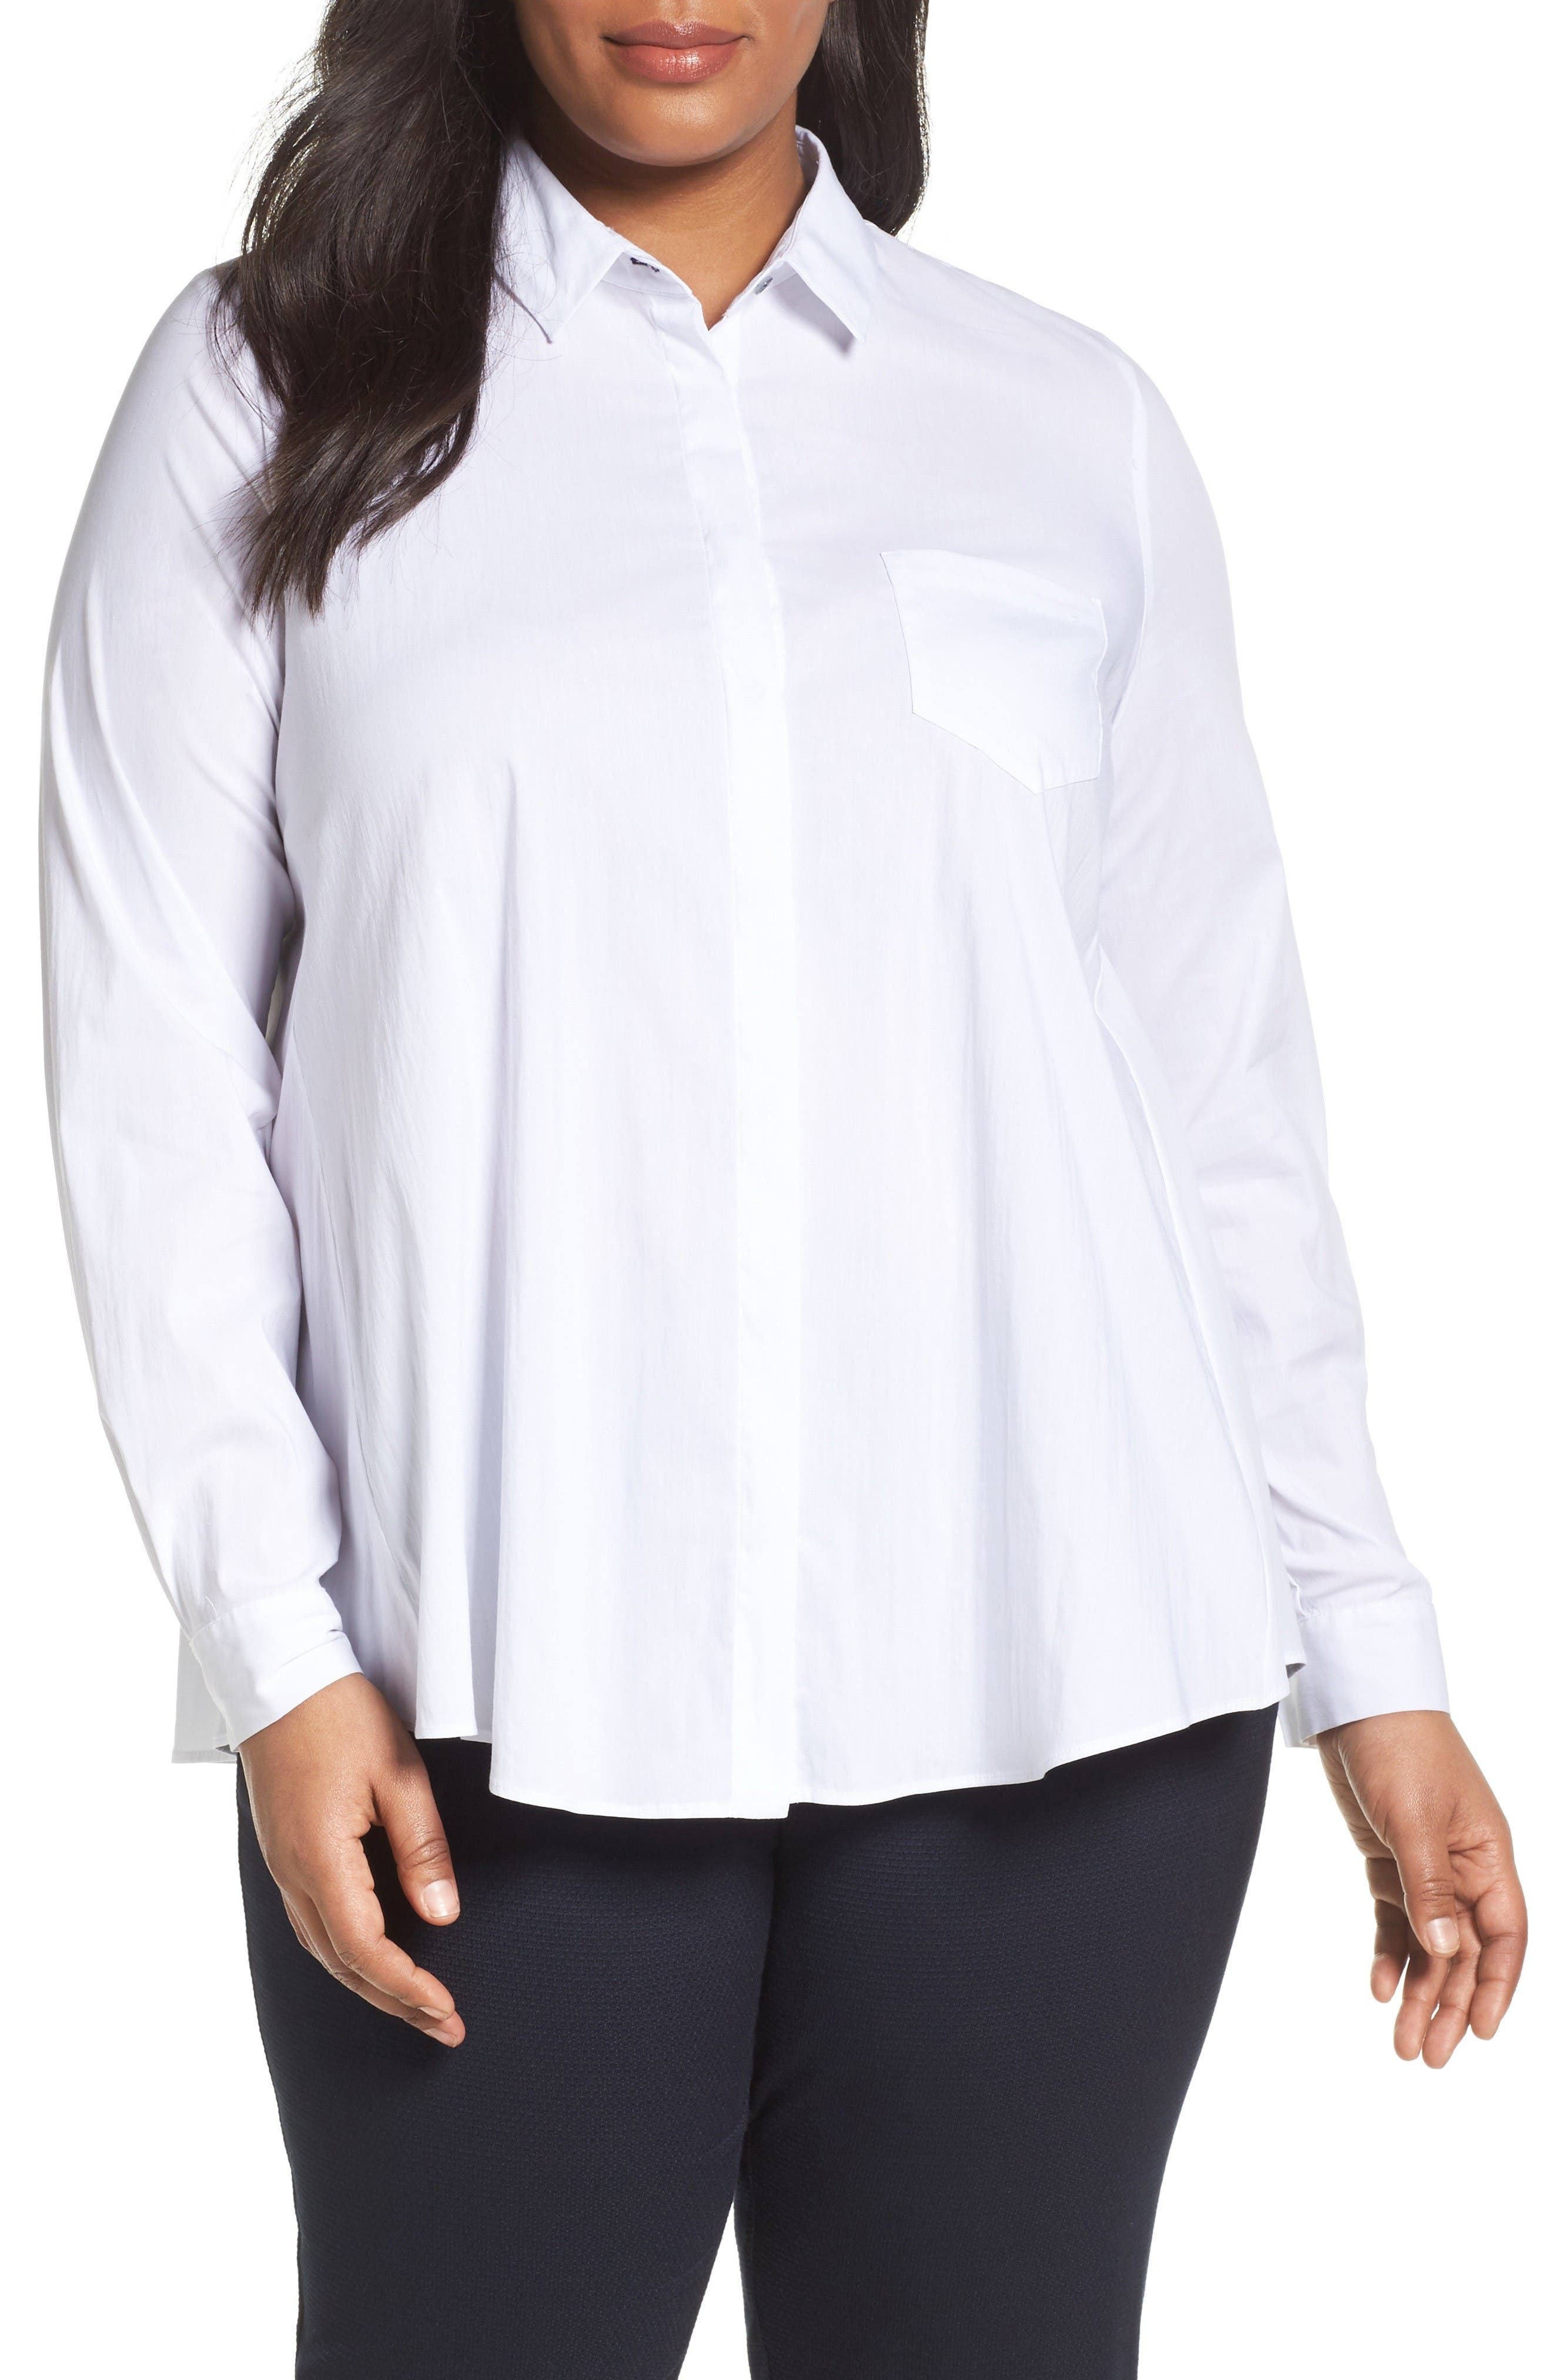 PERSONA BY MARINA RINALDI Beta Stretch Poplin Shirt